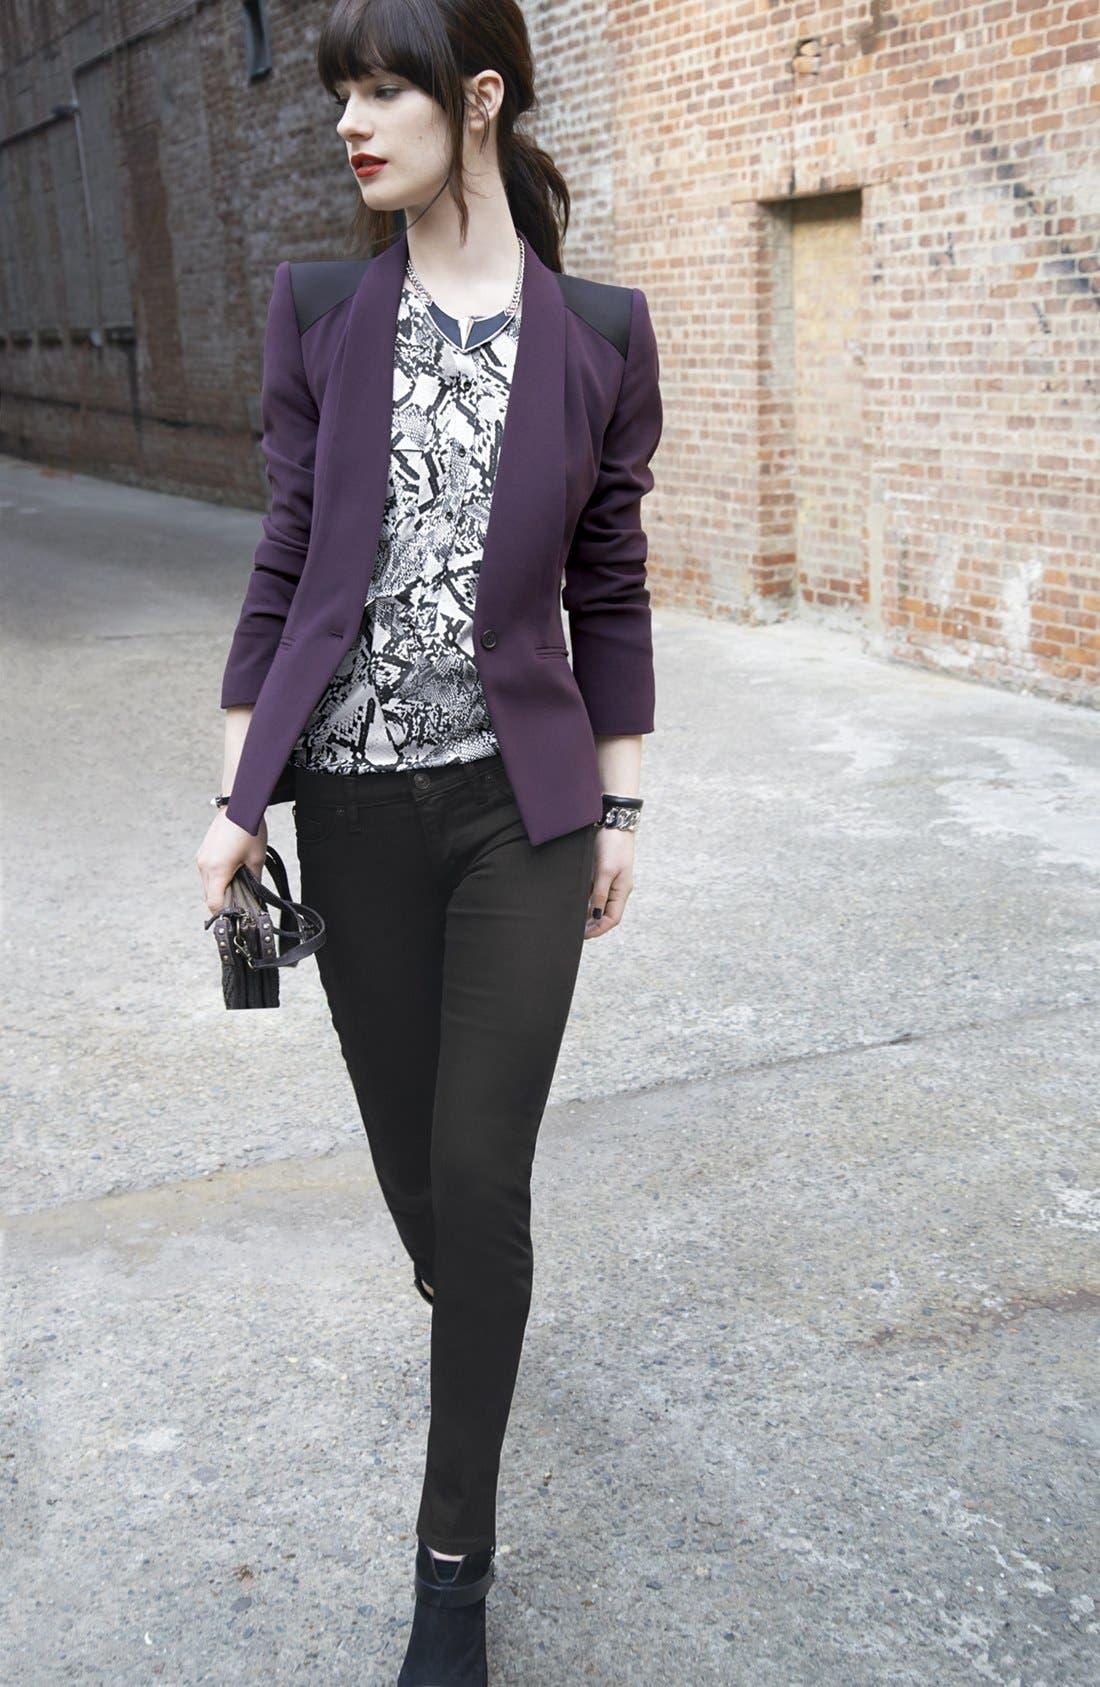 Alternate Image 1 Selected - Trouvé Blazer, Blouse & Hudson Jeans Skinny Jeans